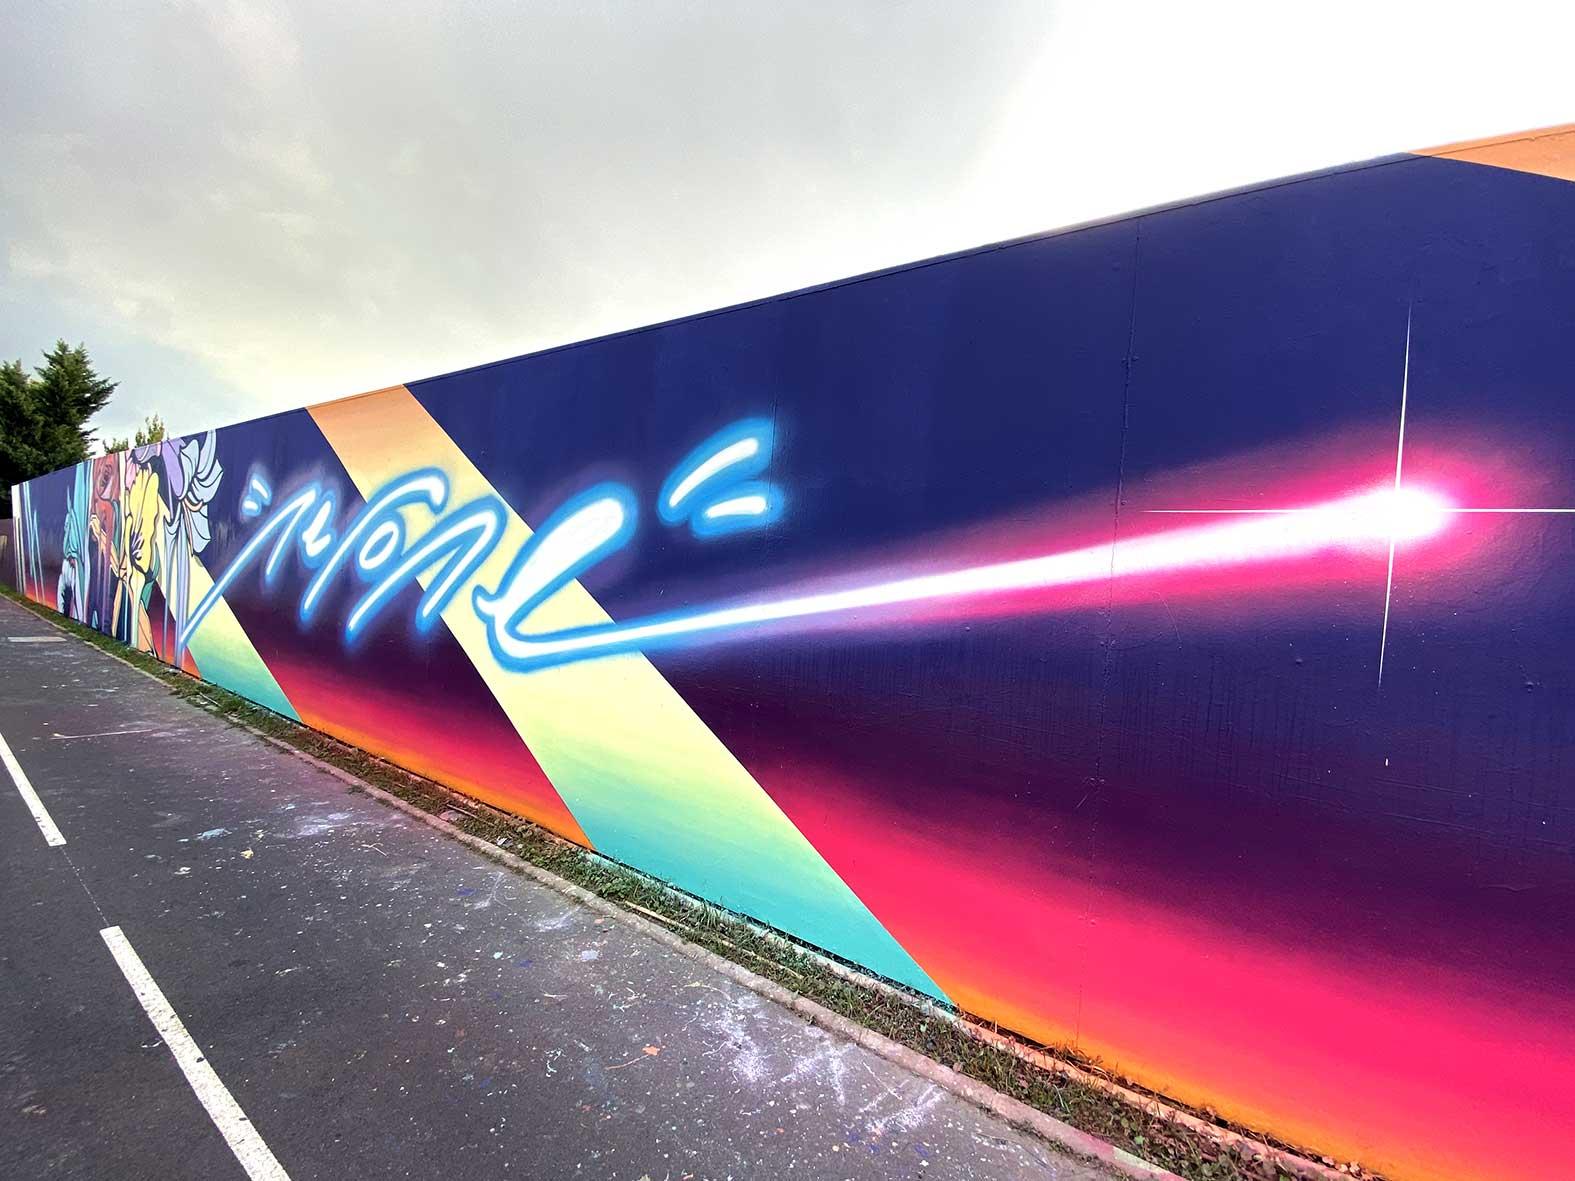 nerone-le-mur-de-perols-street-art-12